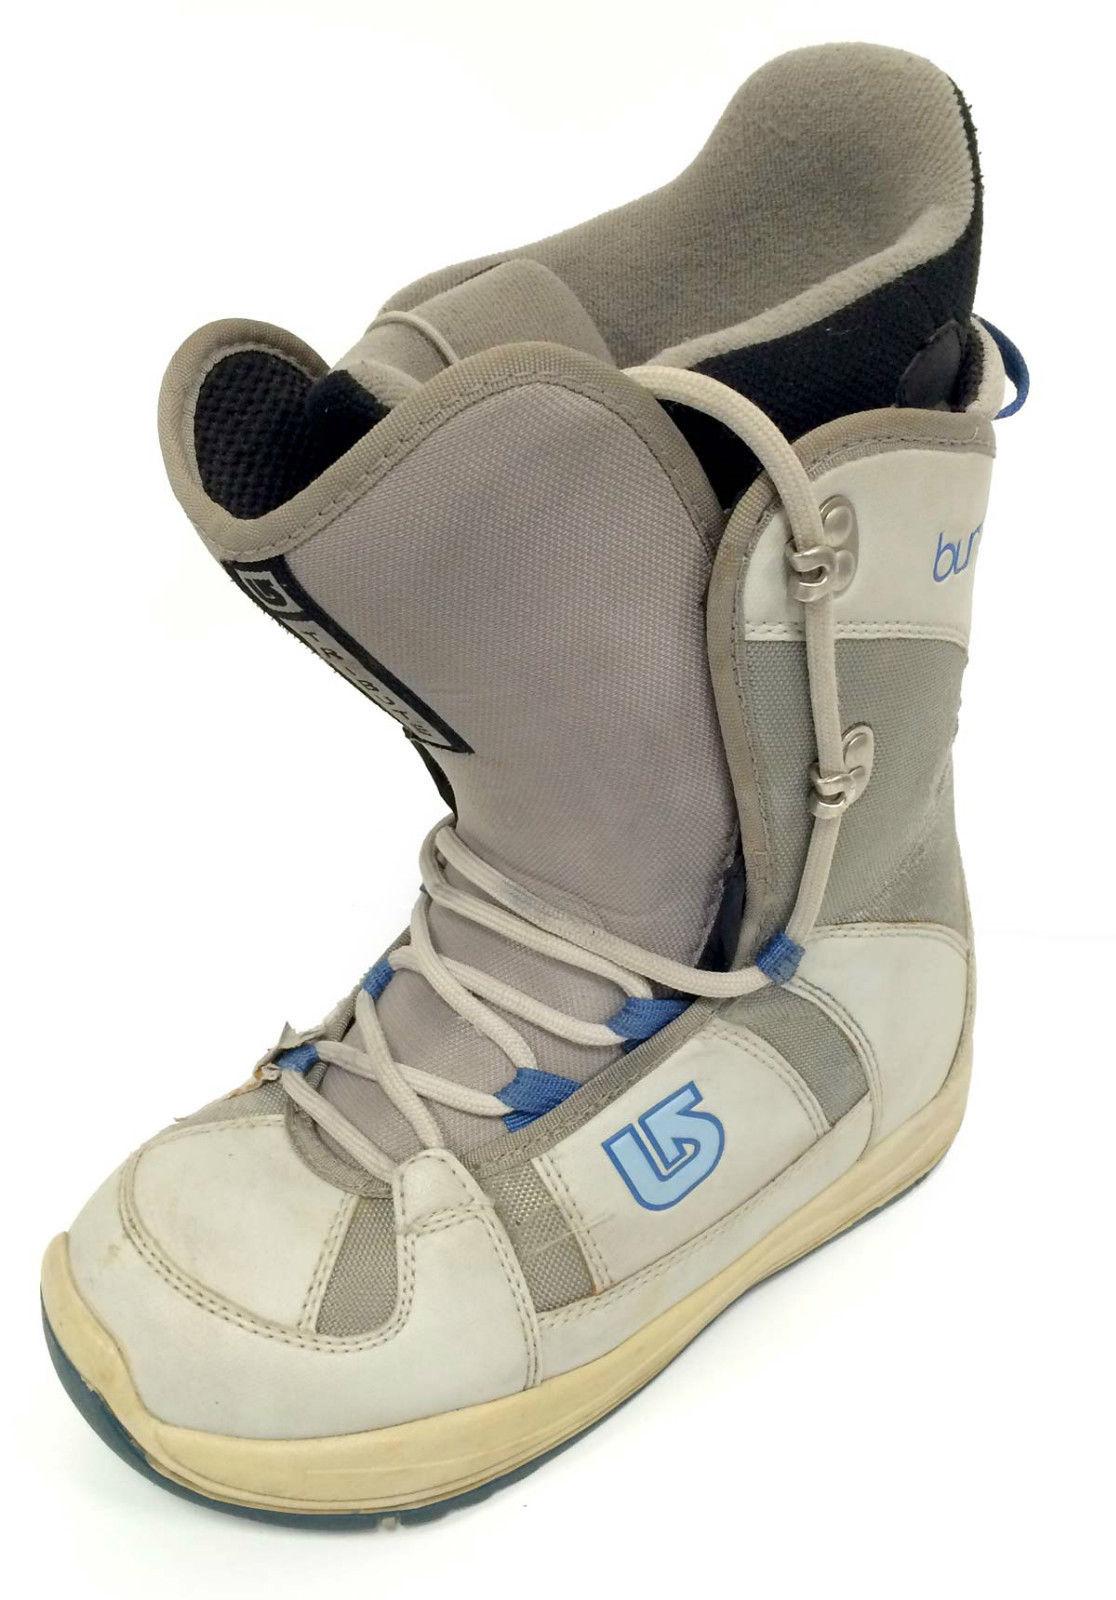 burton tribute womens snowboard boots uk 4 5